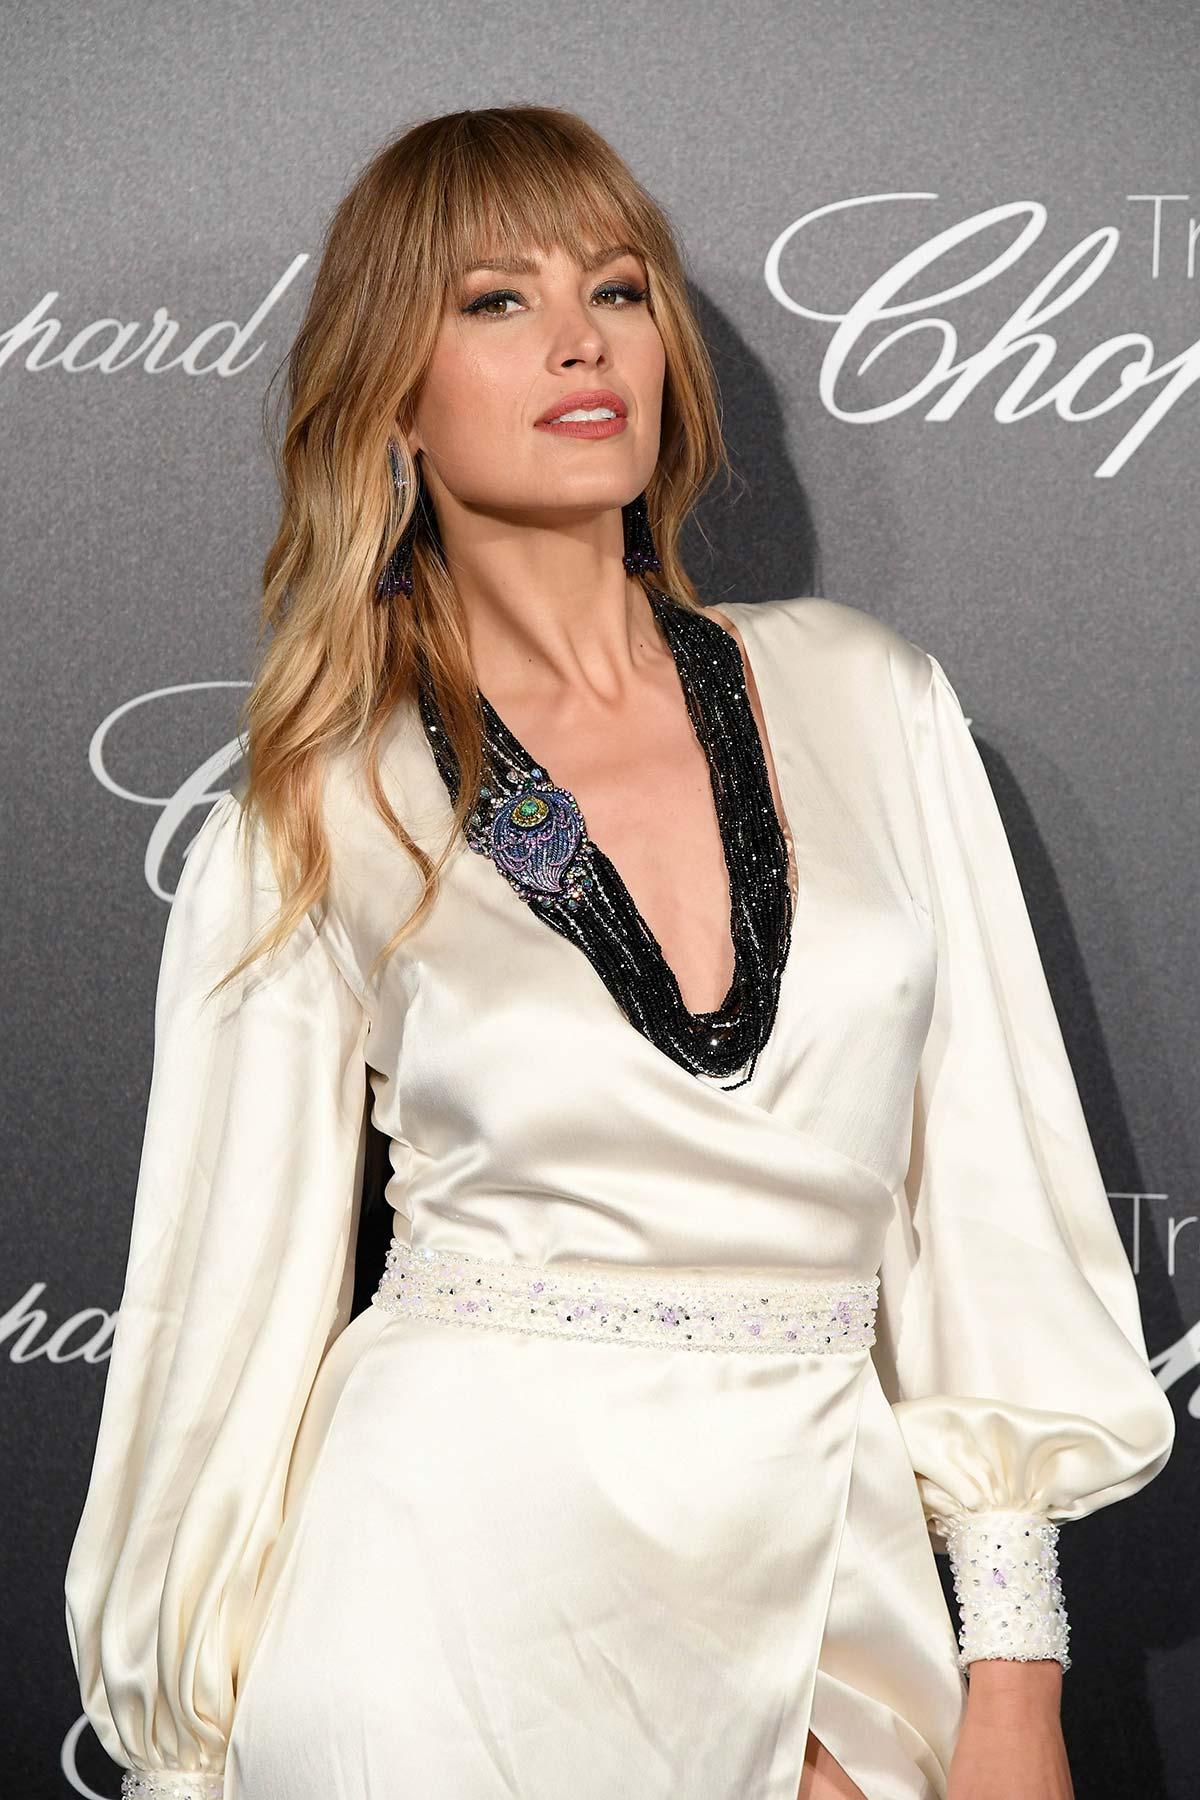 Cannes 2018 - Trophee Chopard - Petra Nemcova - Hair and makeup Massimo Serini